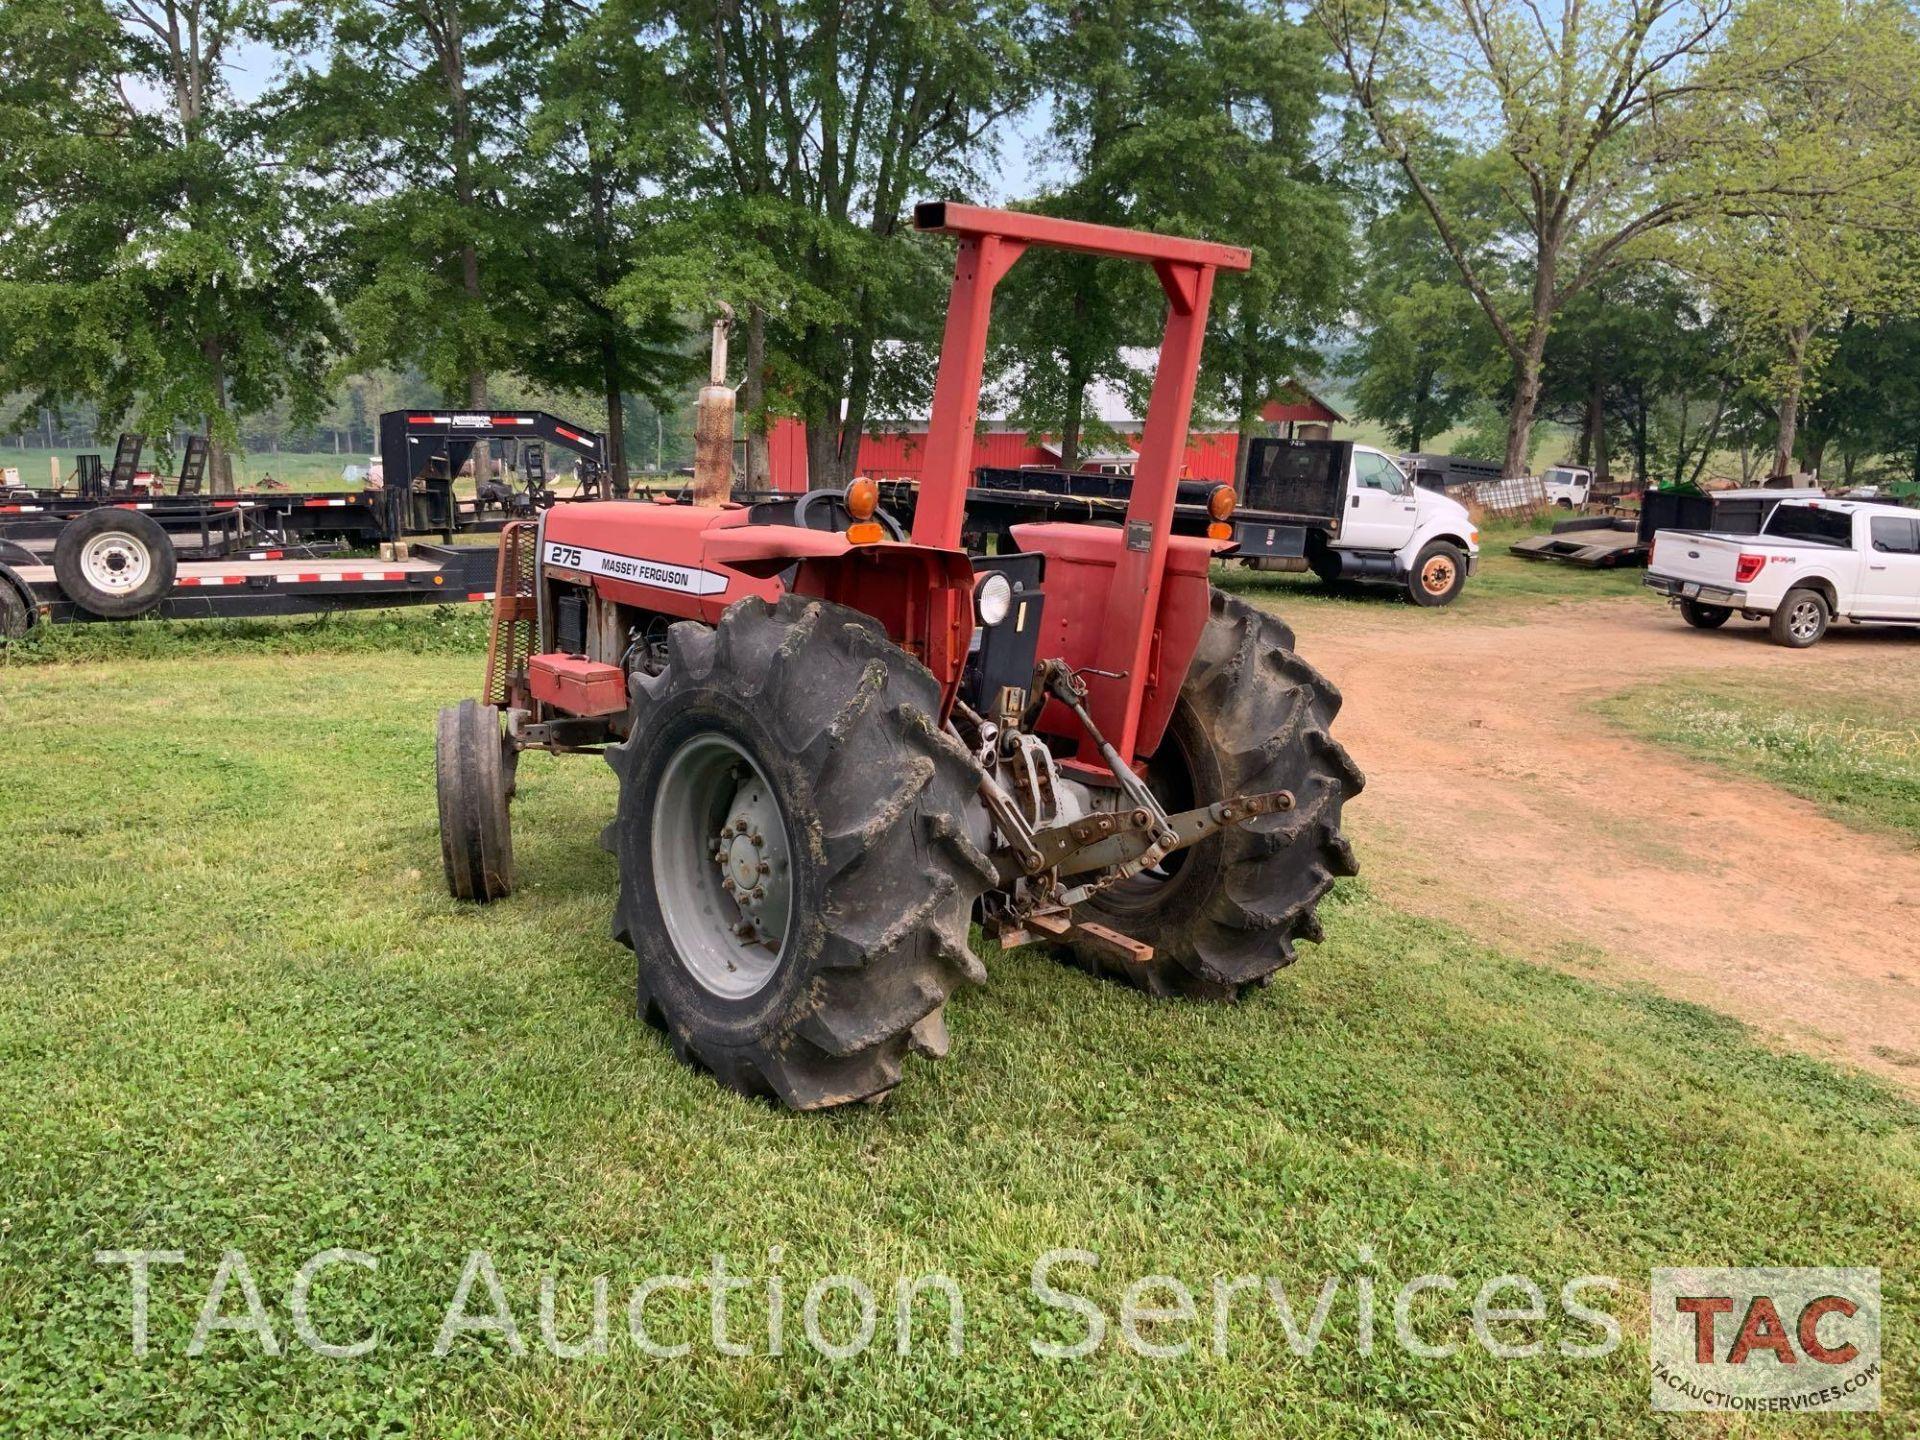 Massey Ferguson 275 Farm Tractor - Image 7 of 25